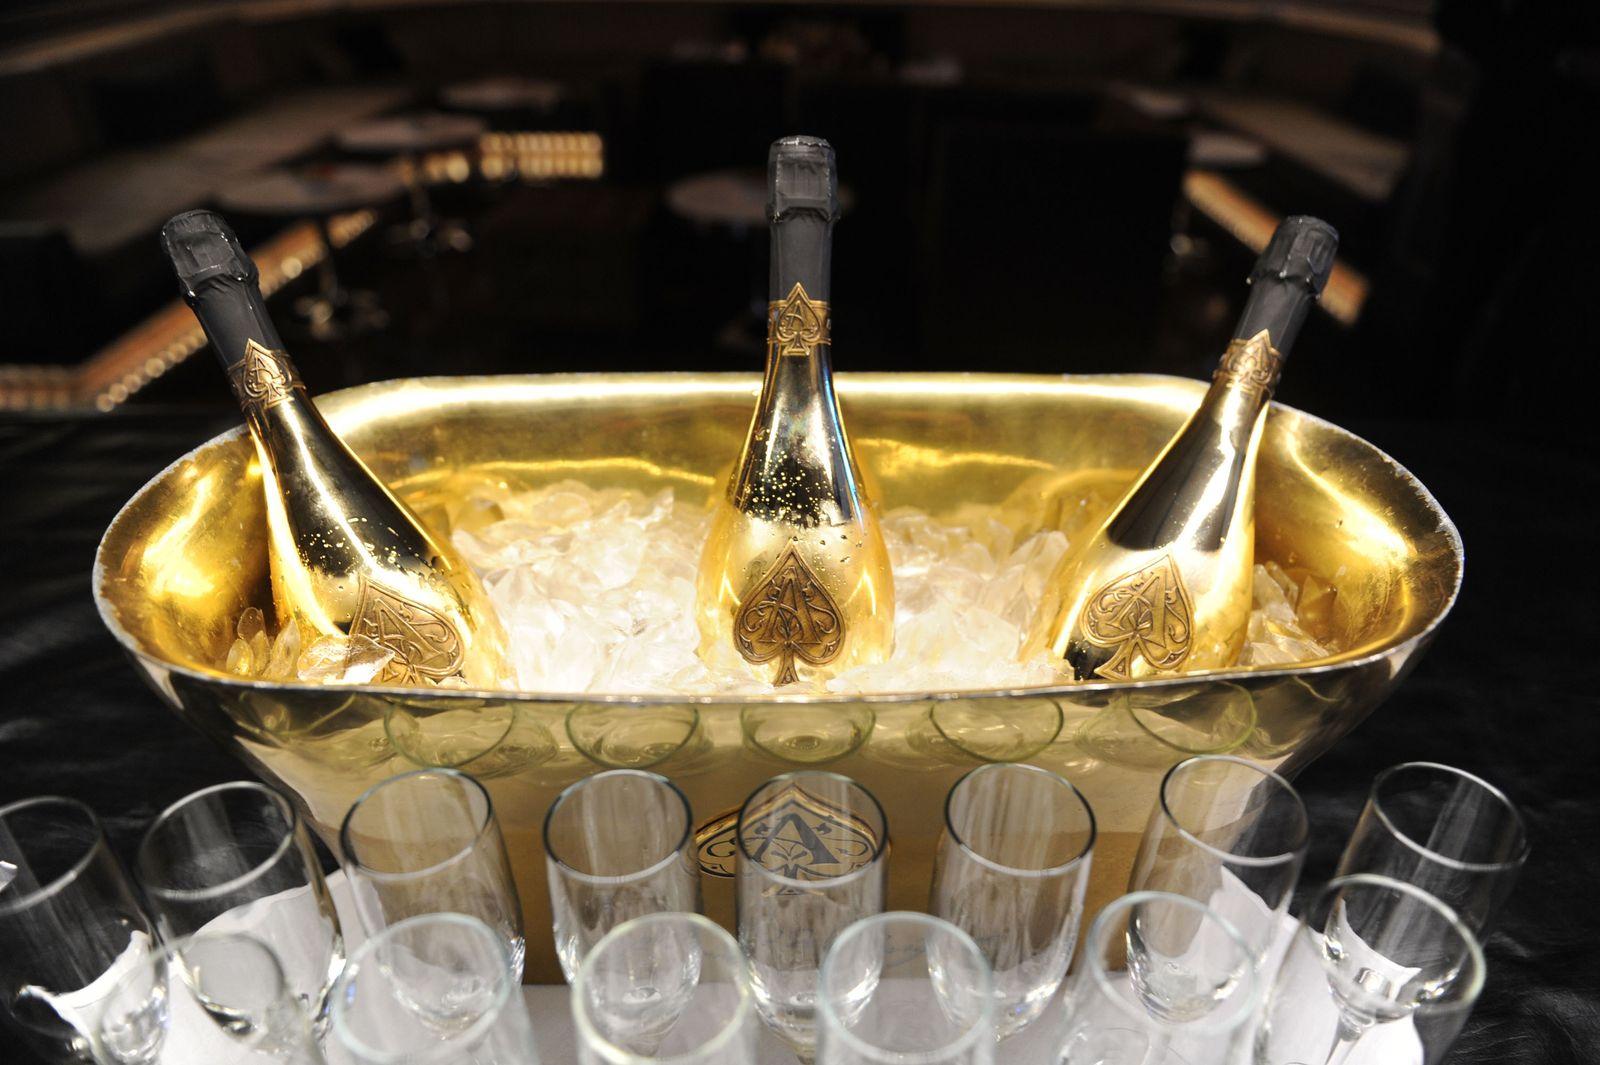 Jay-Z / Armand de Brignac / Ace of Spades Champagne